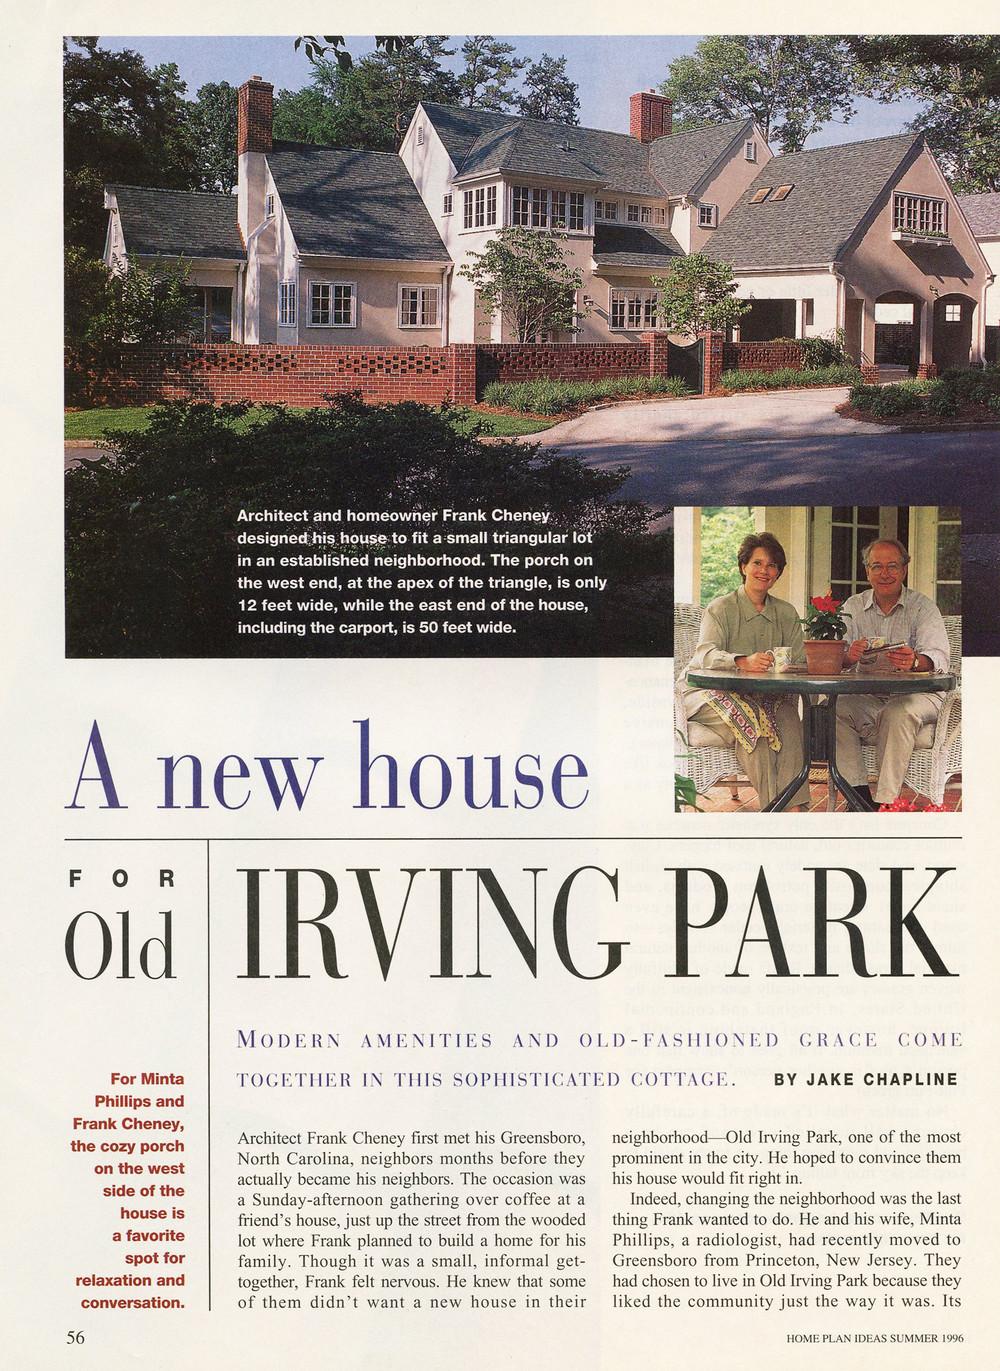 home-plan-ideas-summer-1996-frank-cheney-architect-1.jpg